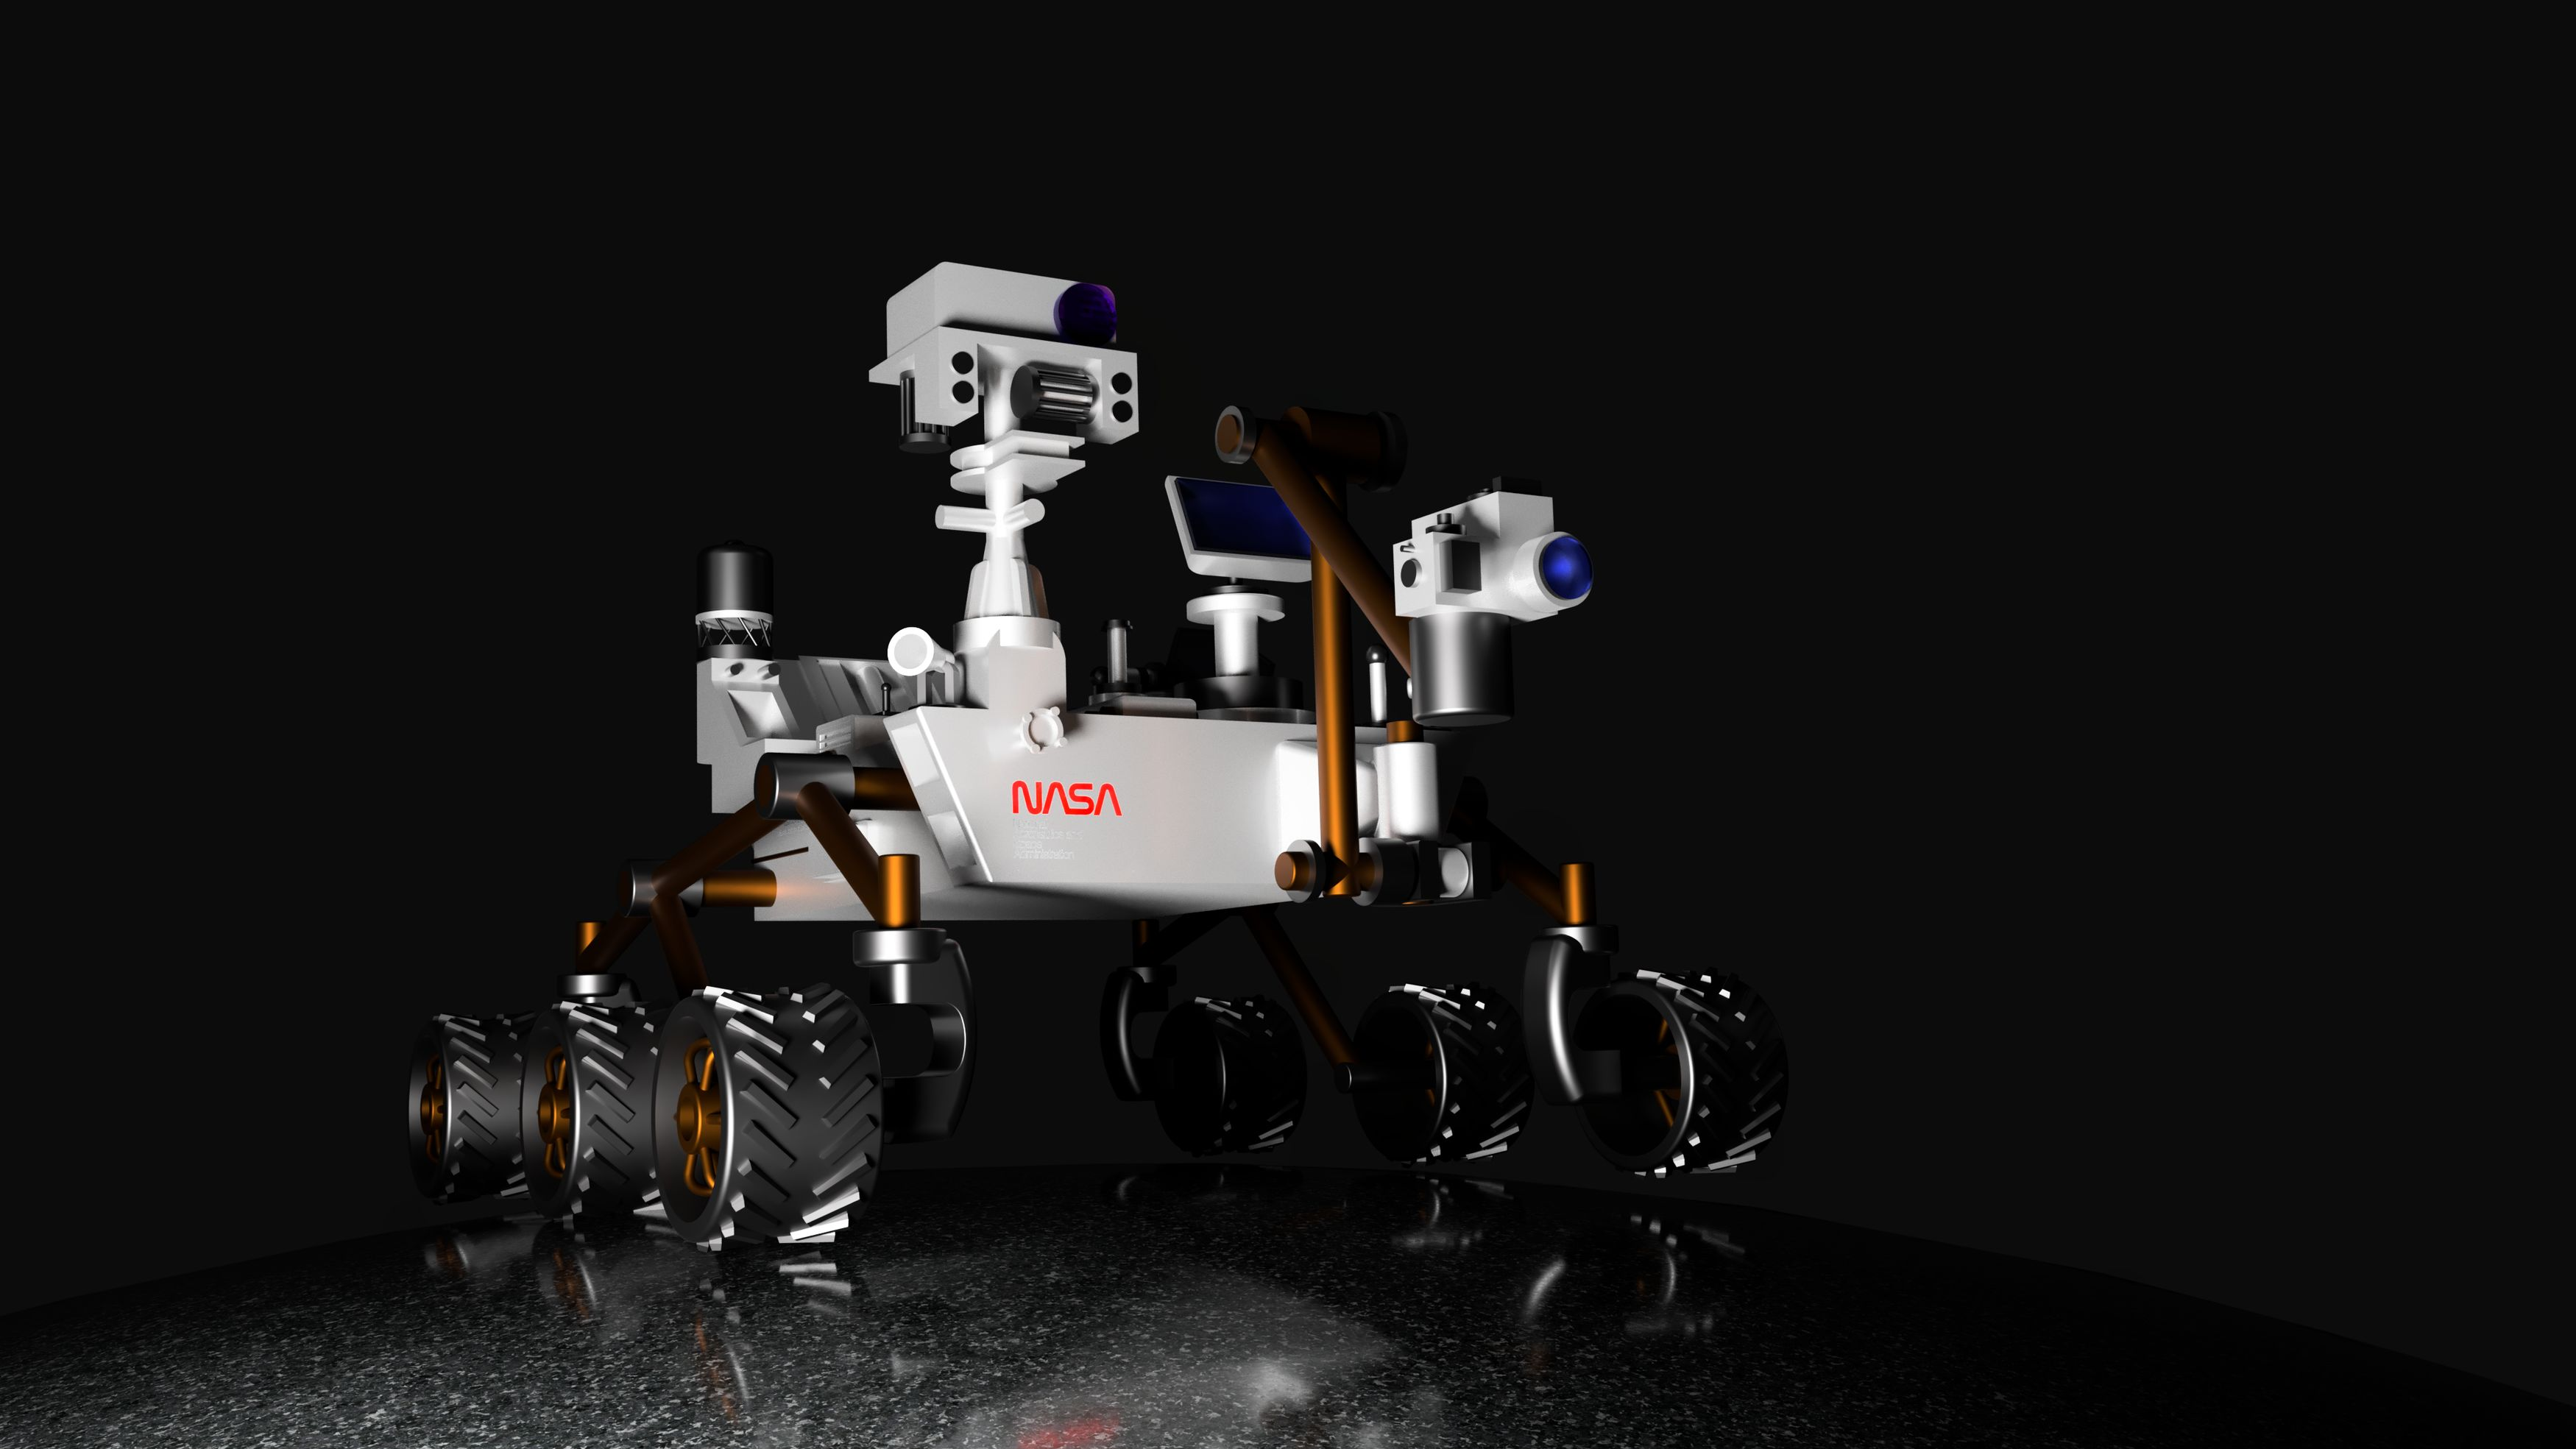 Robot-space-nasa---lcs2020-2020-may-06-10-49-48pm-000-customizedview7646716579-png-3500-3500